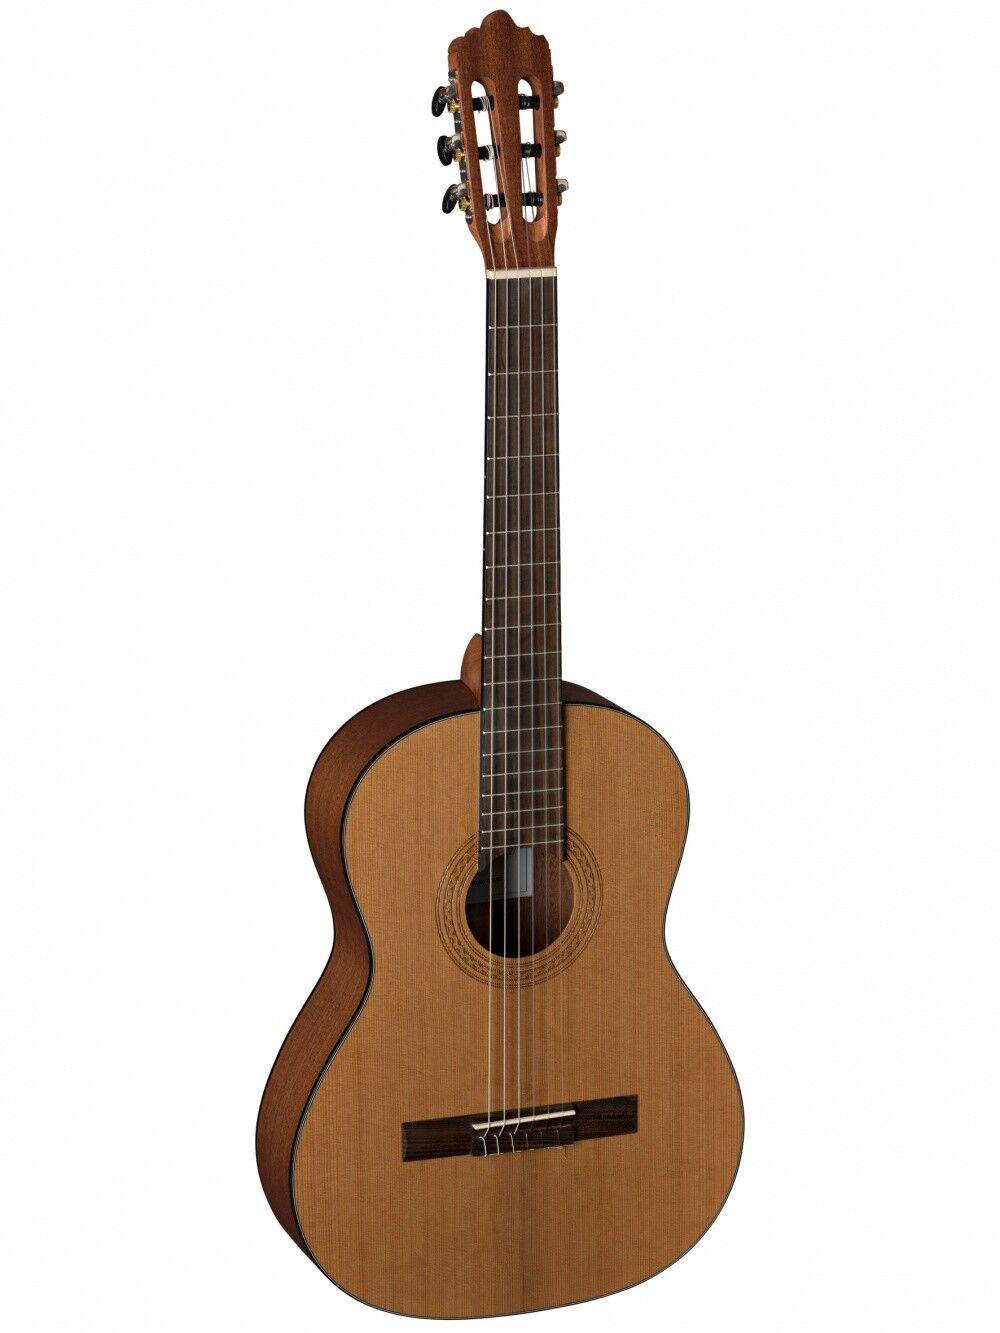 LA MANCHA Rubinito CM 53 Konzert Gitarre 1 2 Größe 1 2 Classic Guitar